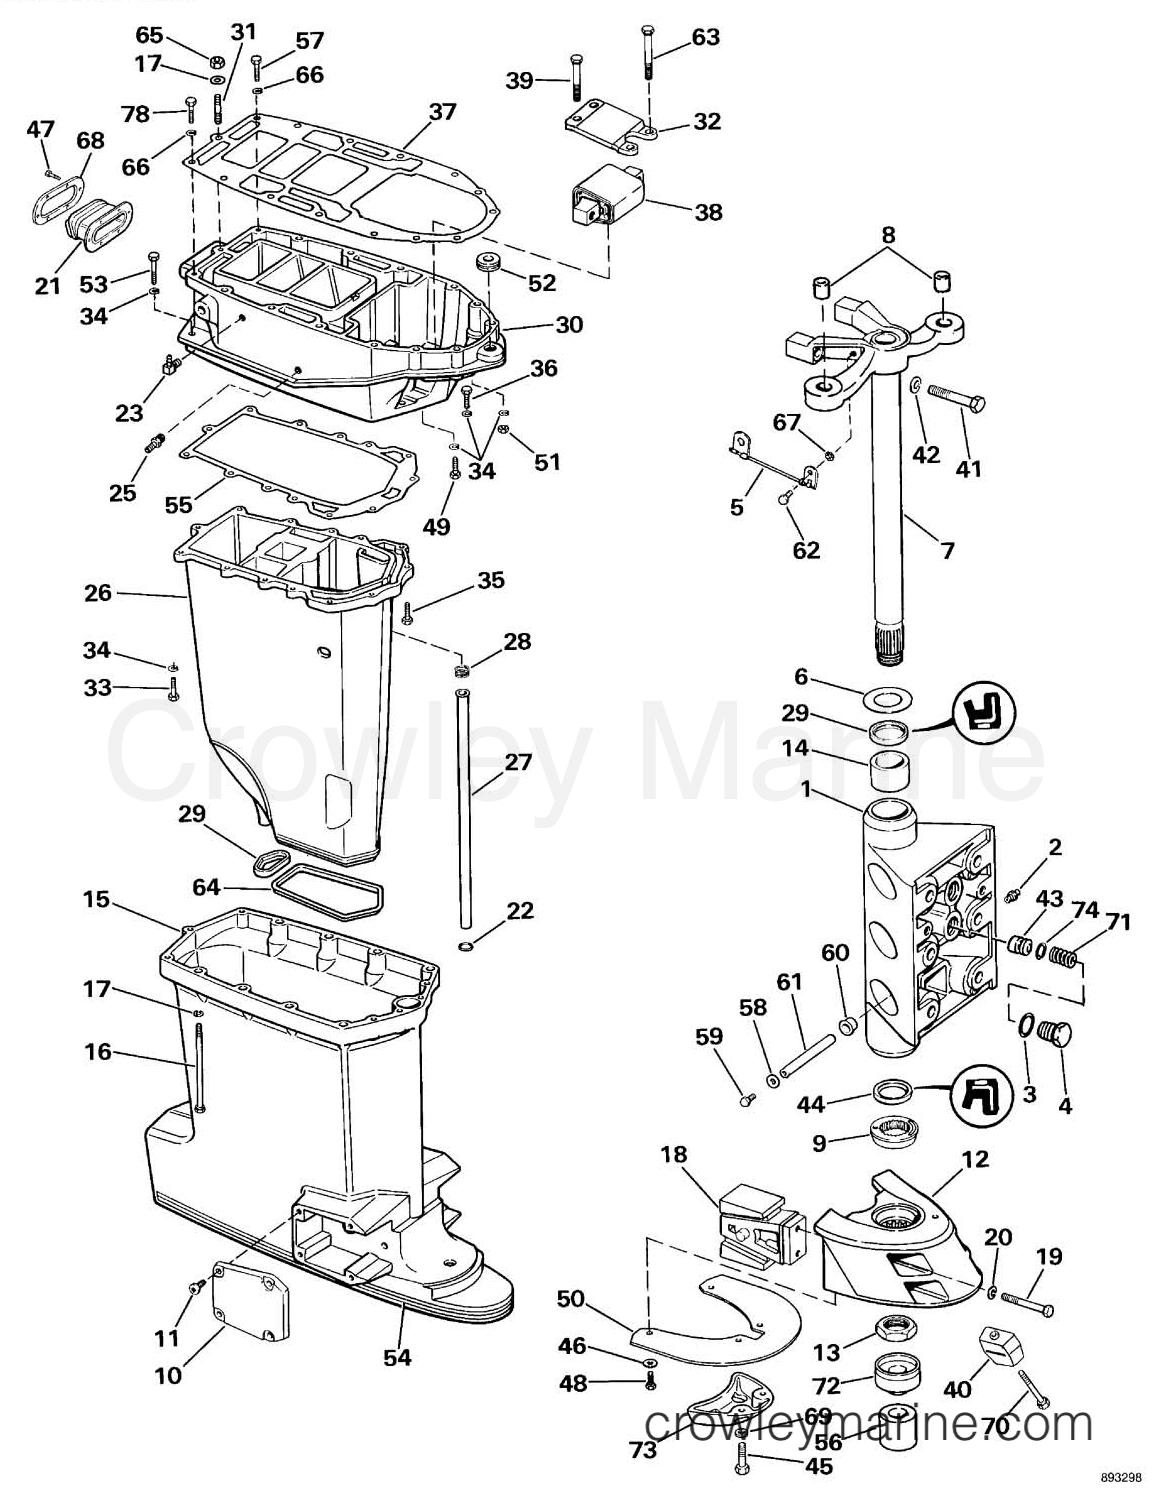 Omc sea drive wiring diagram omc sea drive wiring diagram wiring 96 evinrude